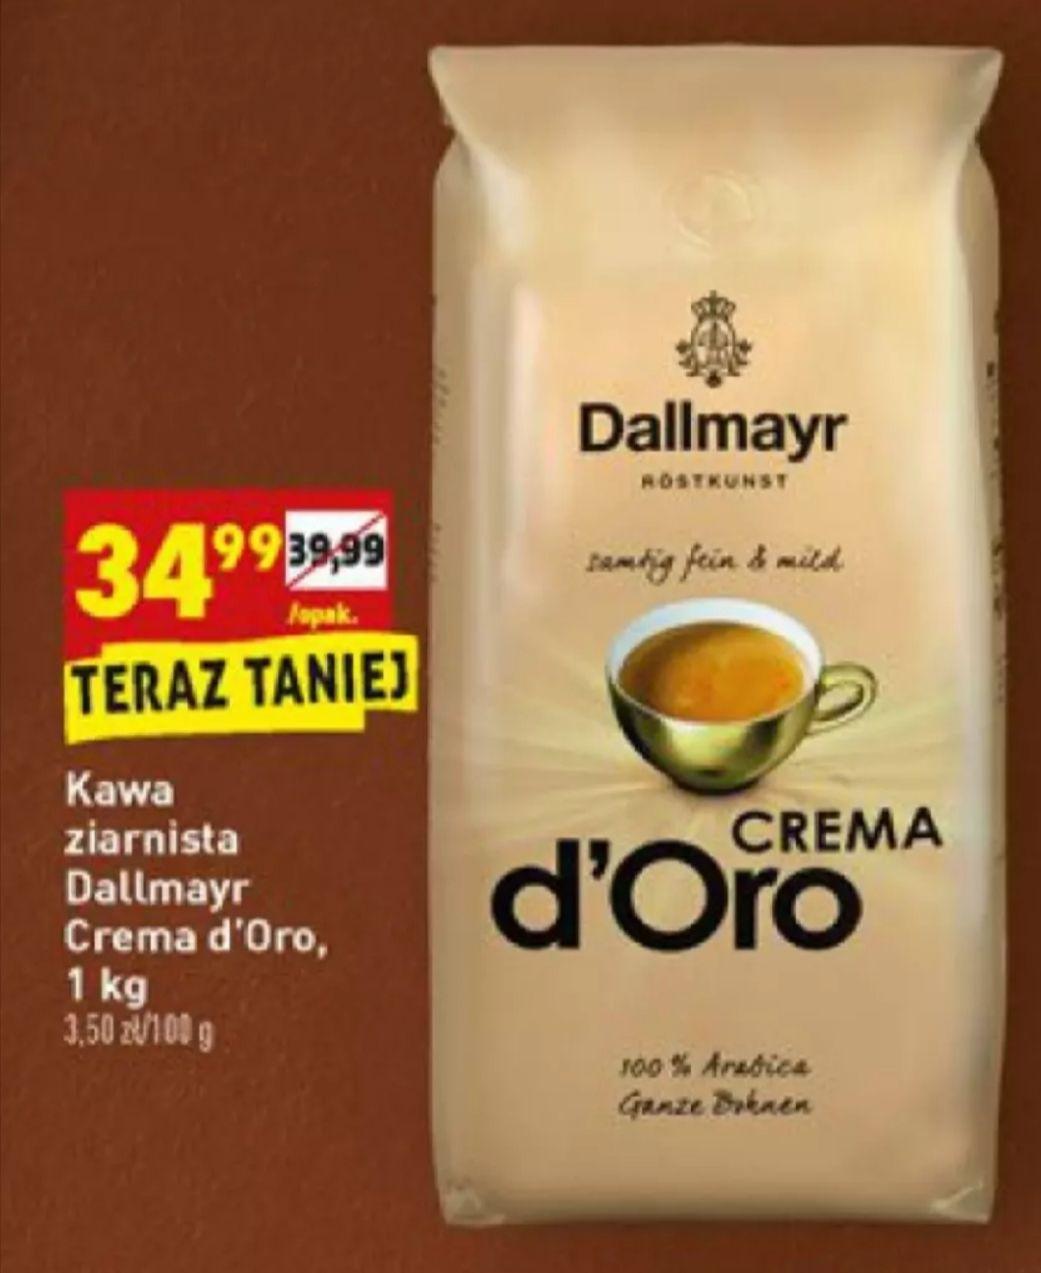 Kawa ziarnista Dallmayr d'oro crema 1kg Biedronka